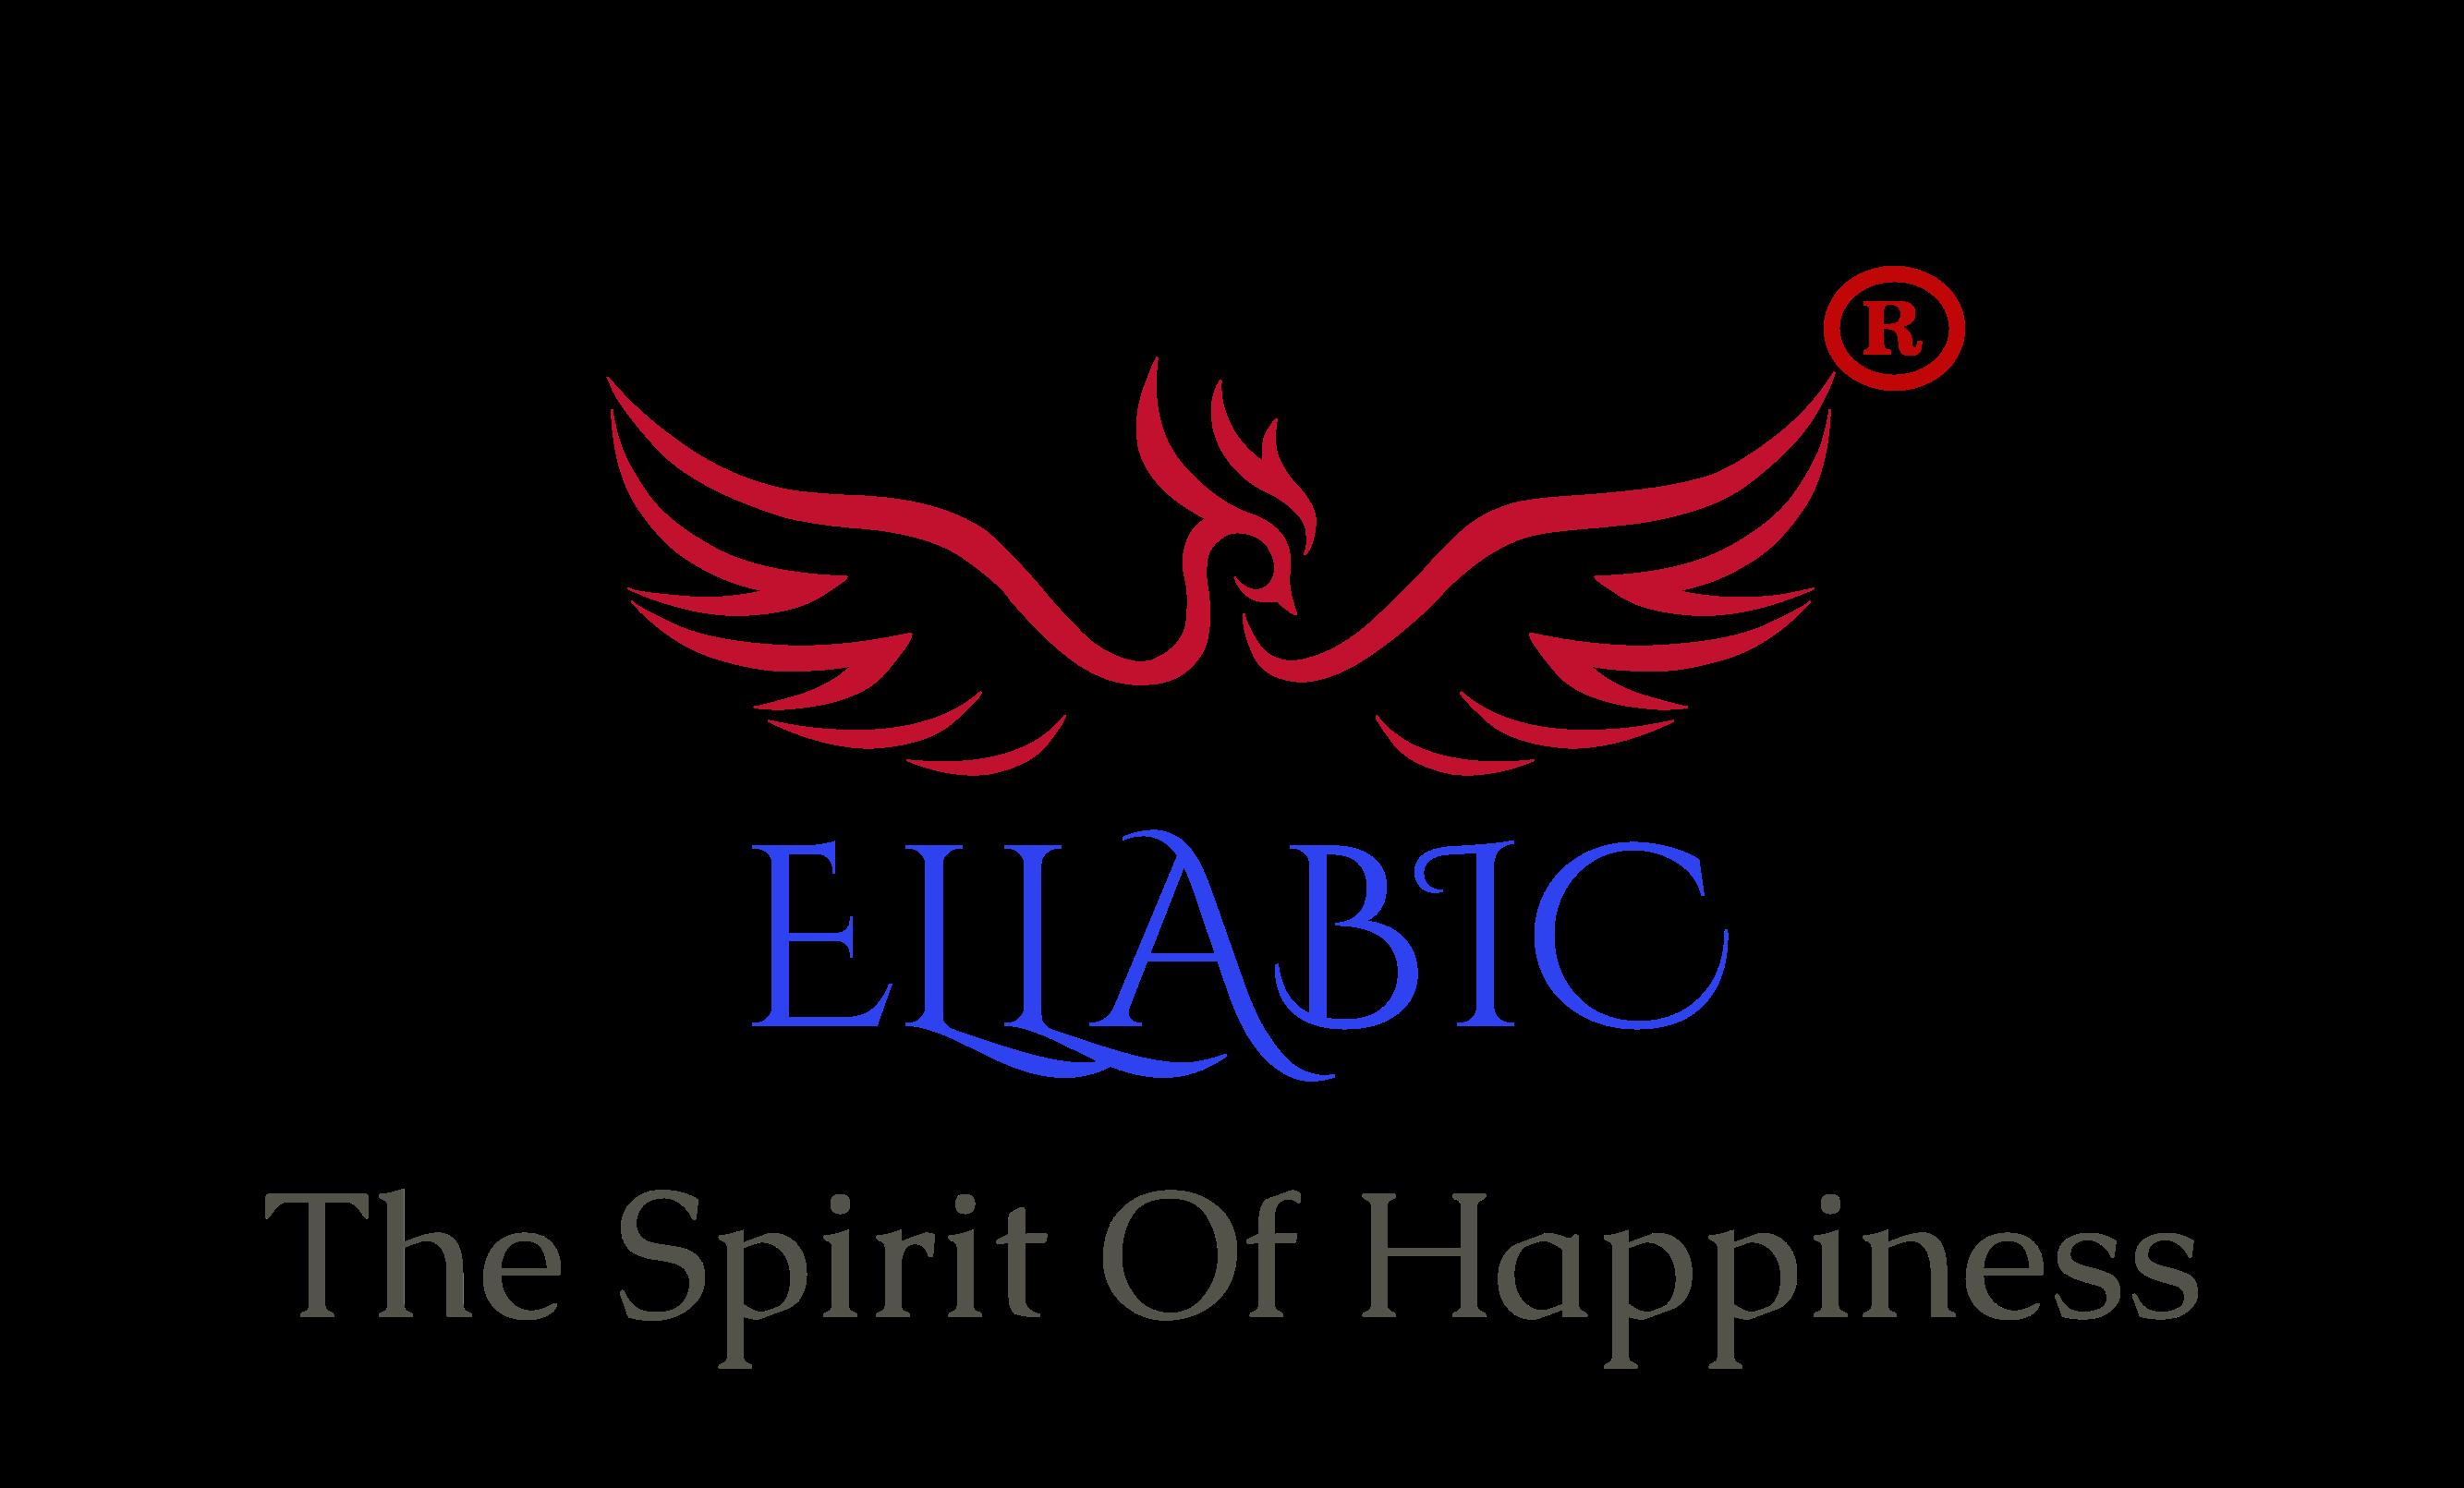 Ellabic